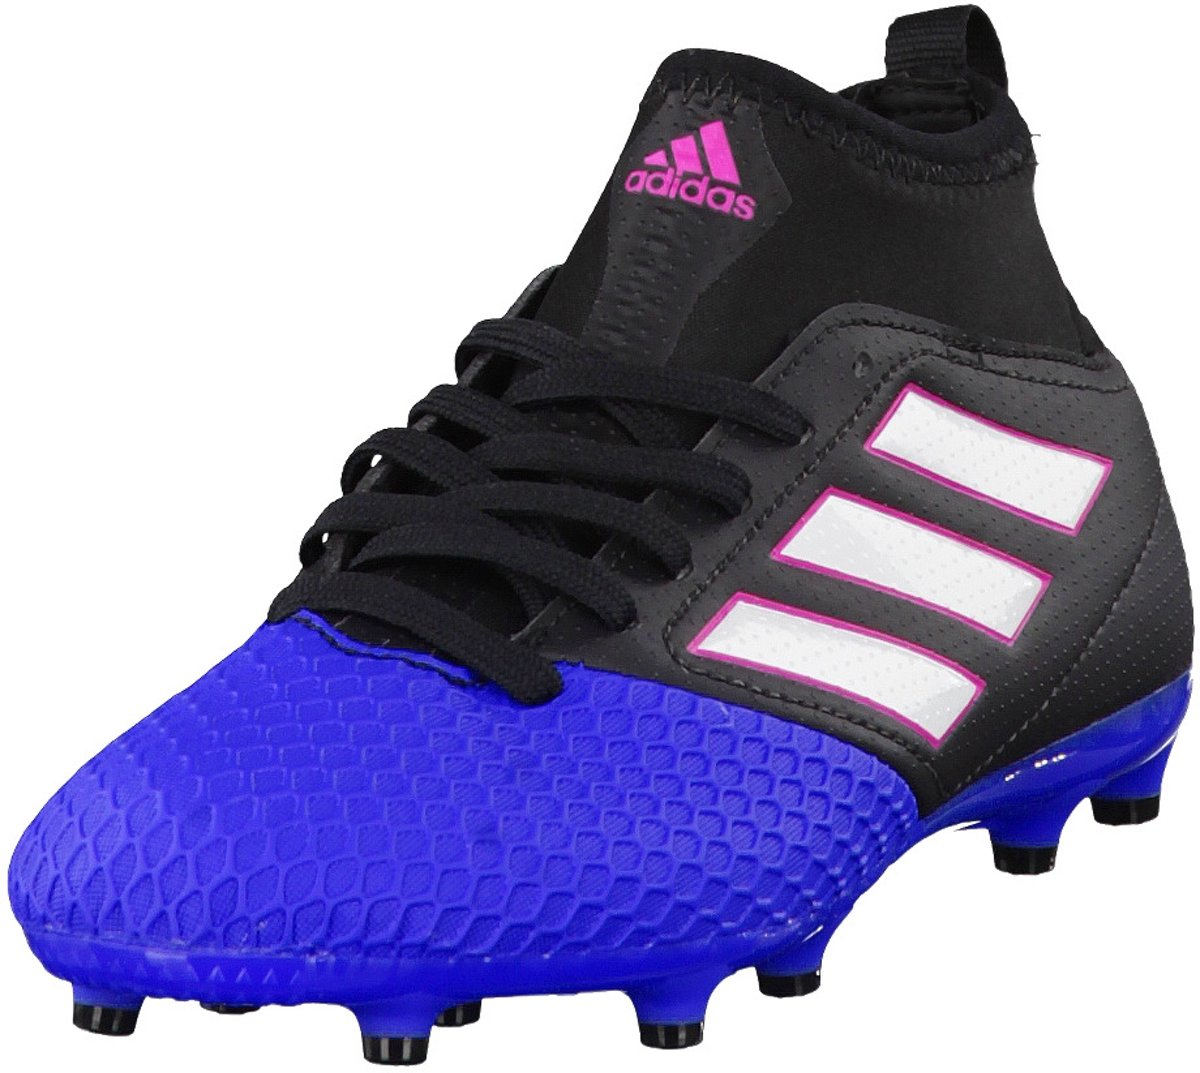 | Adidas Voetbalschoenen Ace 17.3 FG Junior